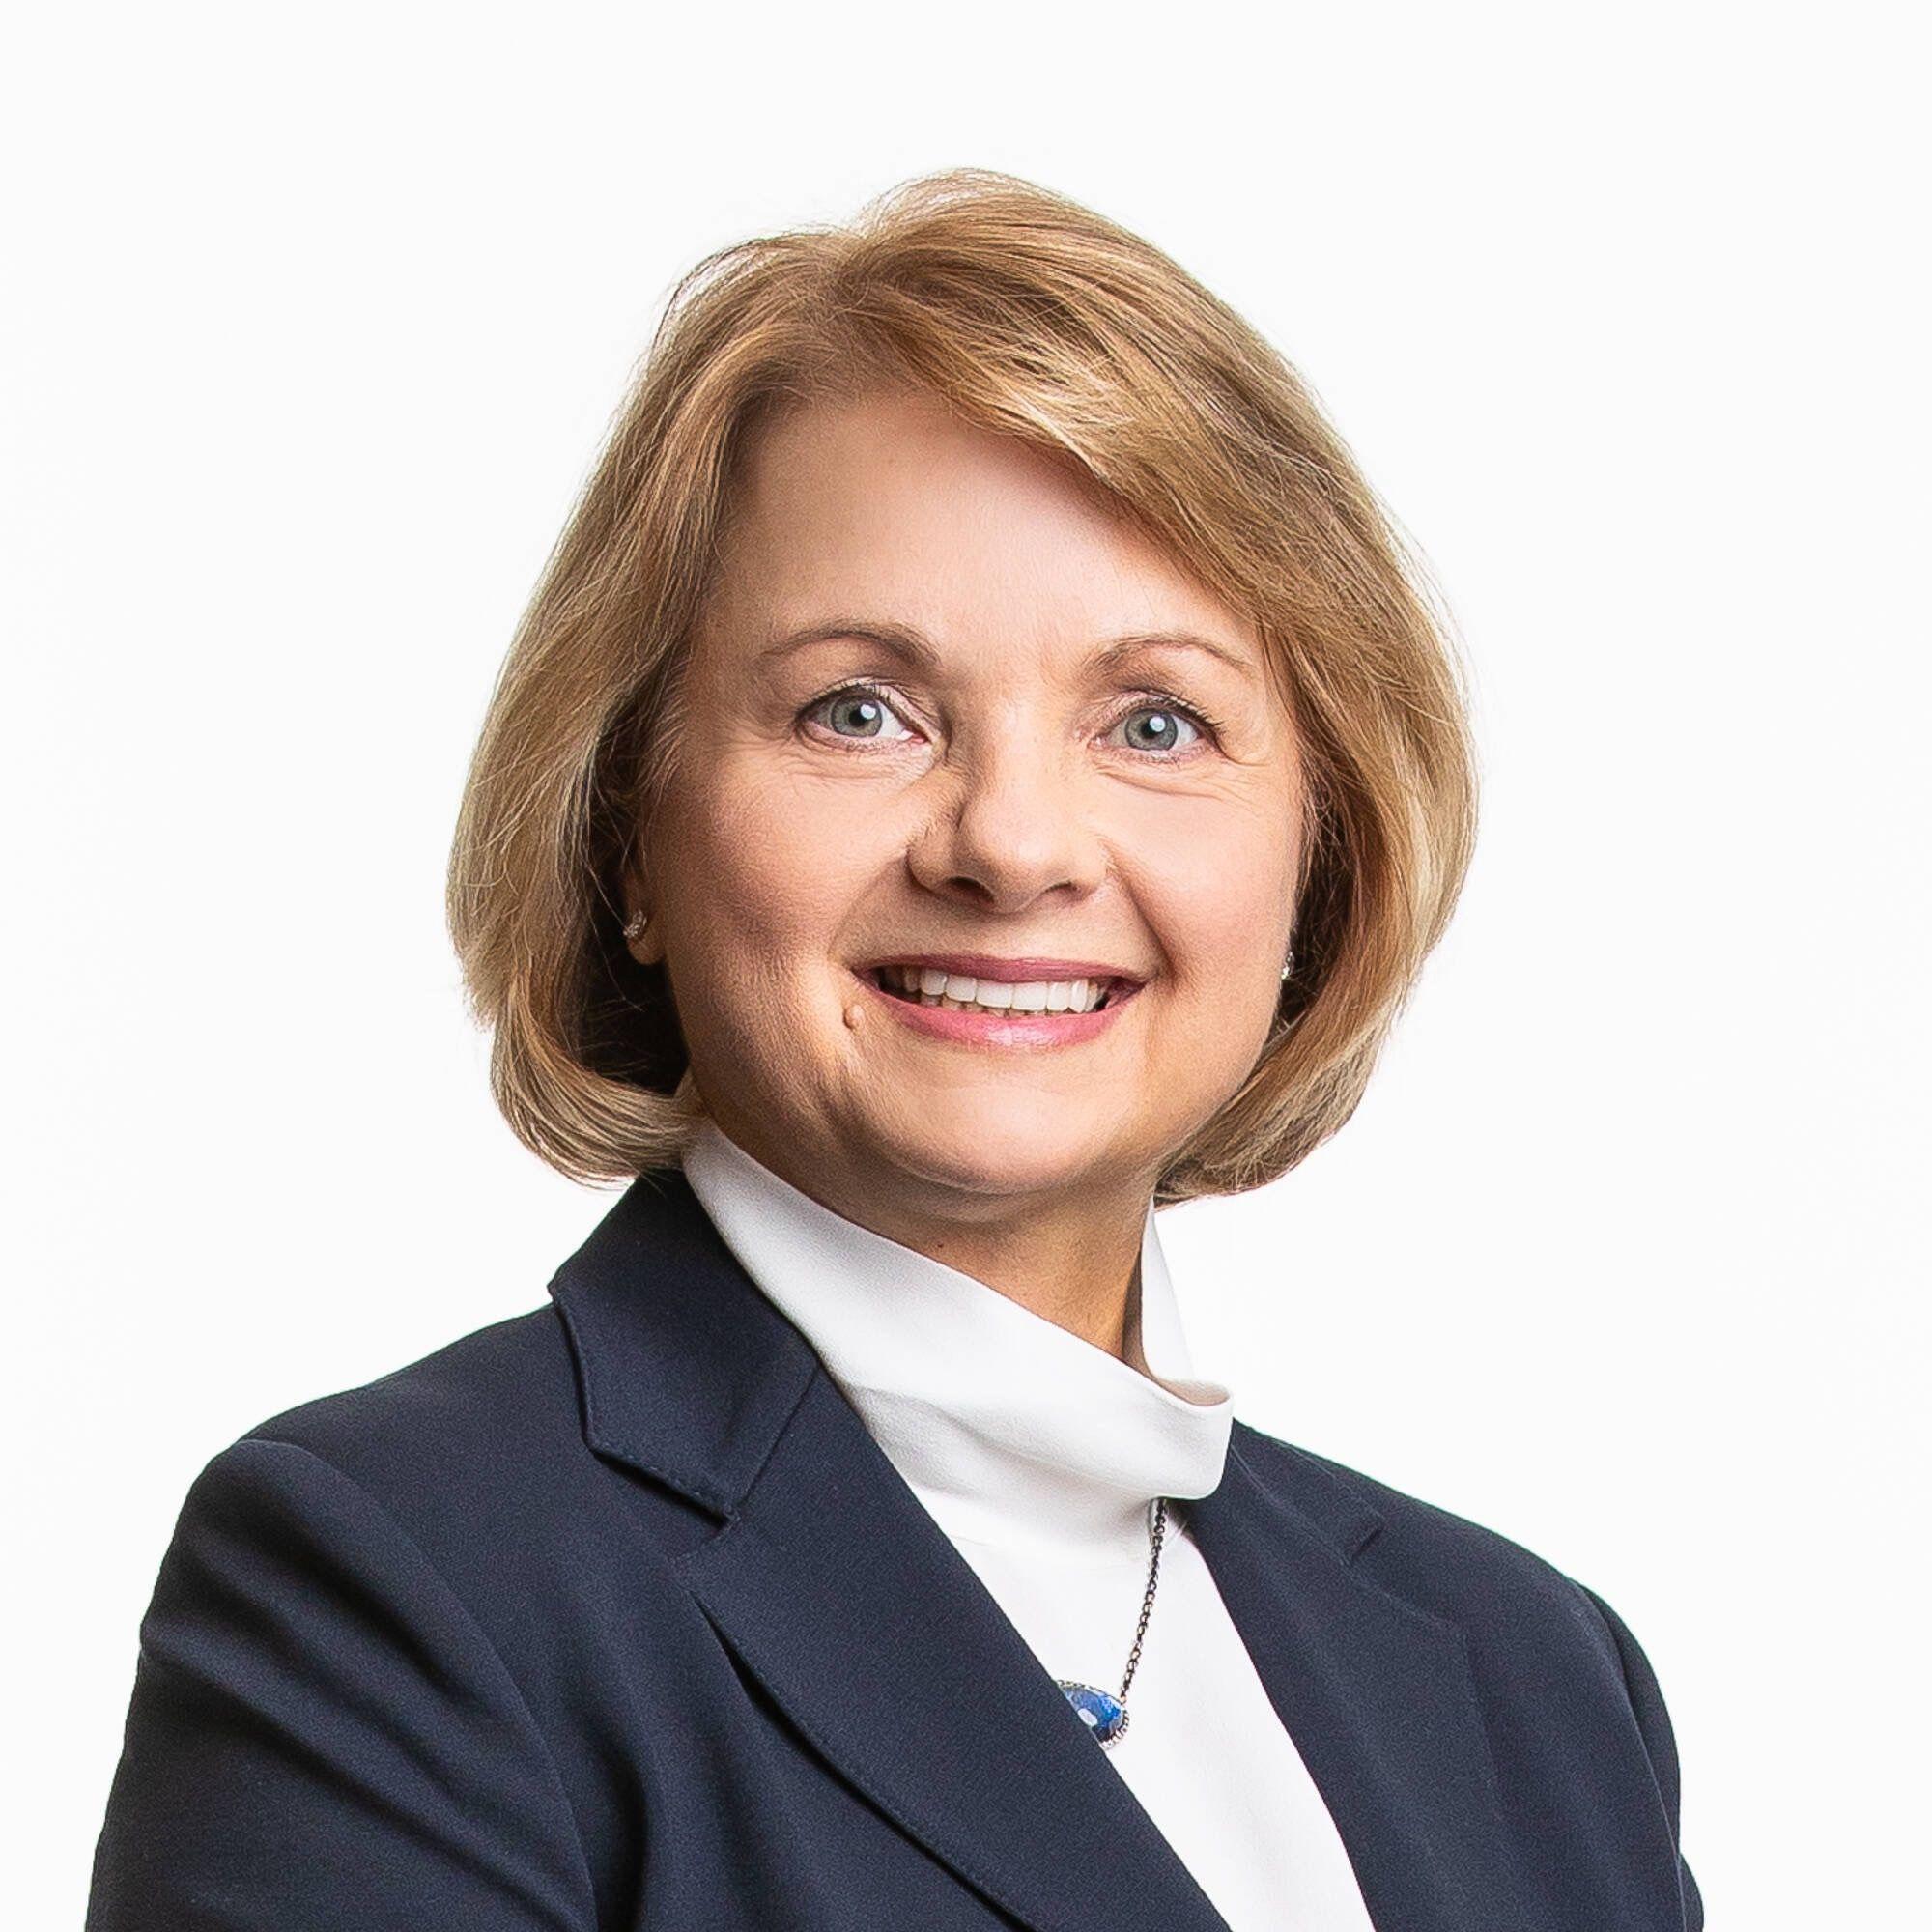 Angela F. Braly